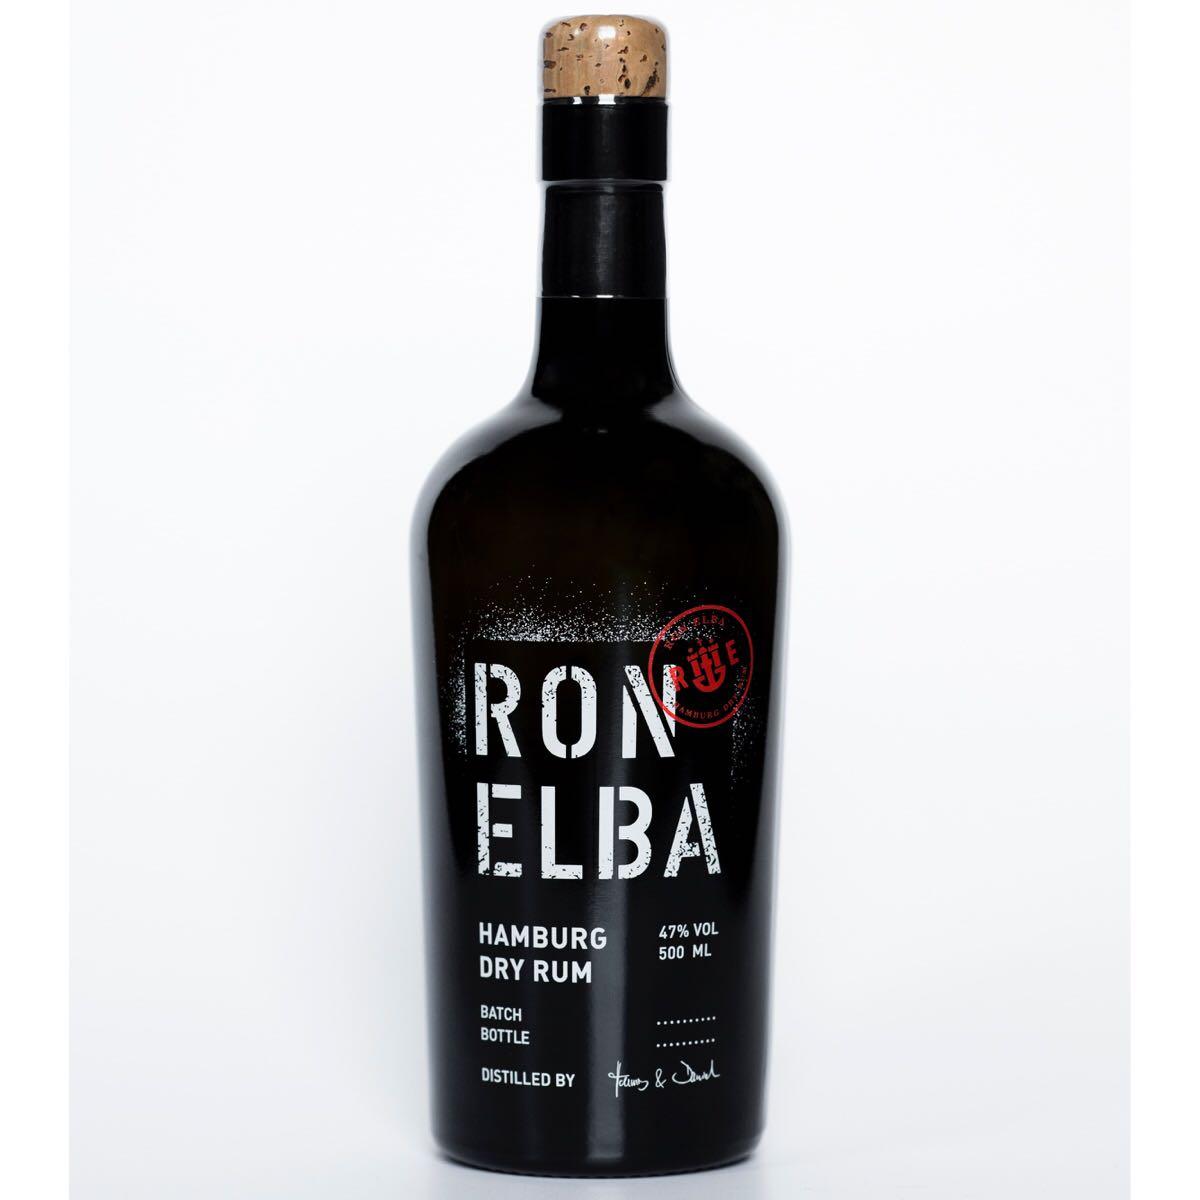 Bottle image of Ron Elba